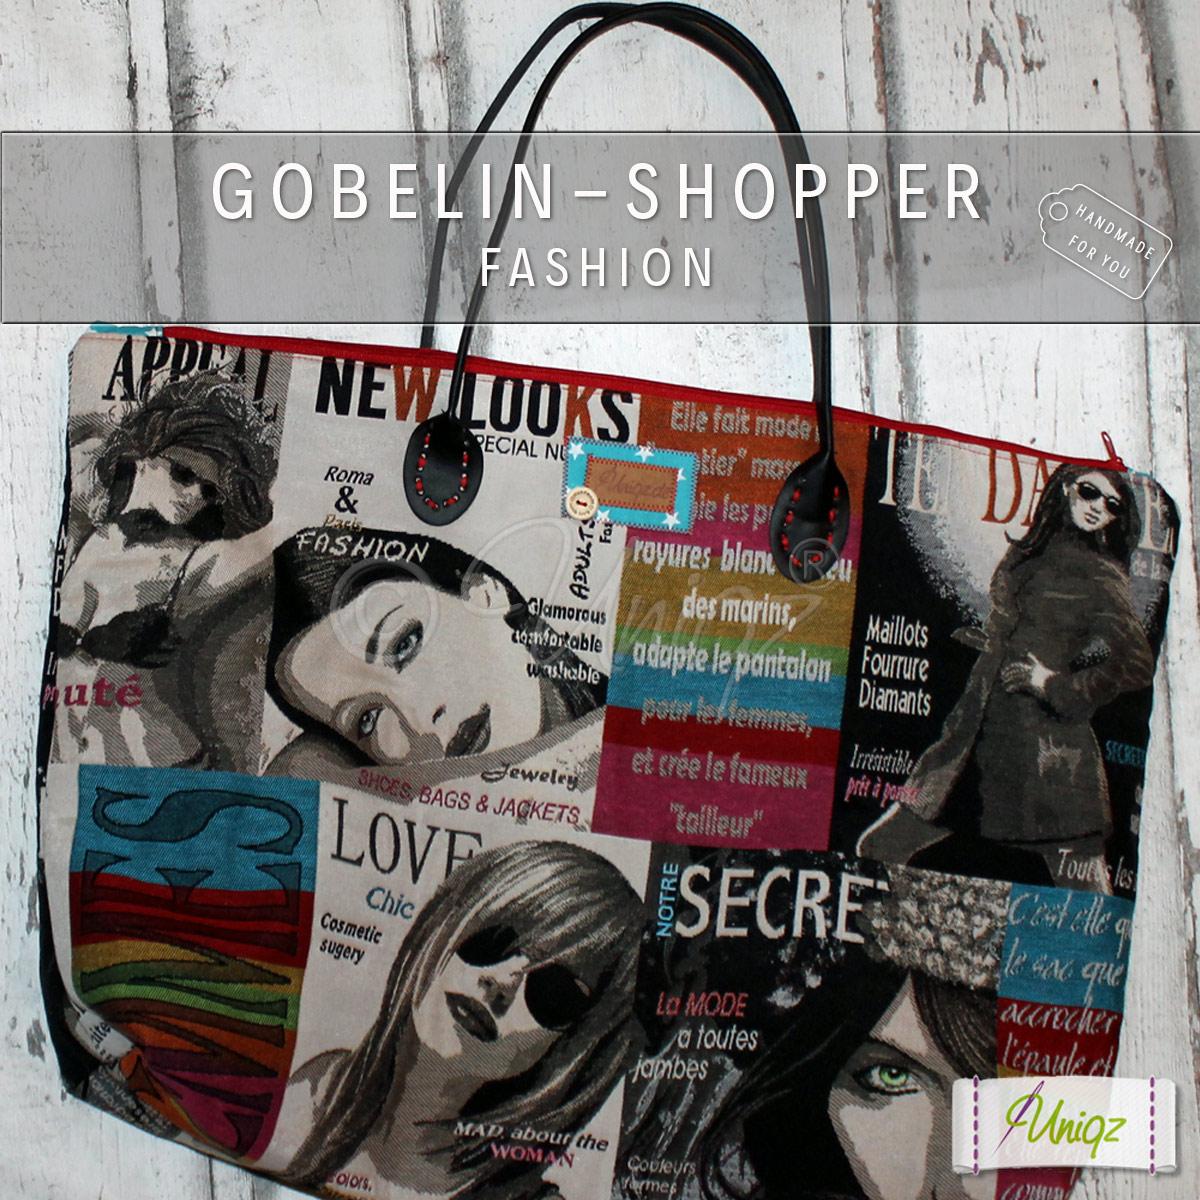 Gobelin Shopper Fashion